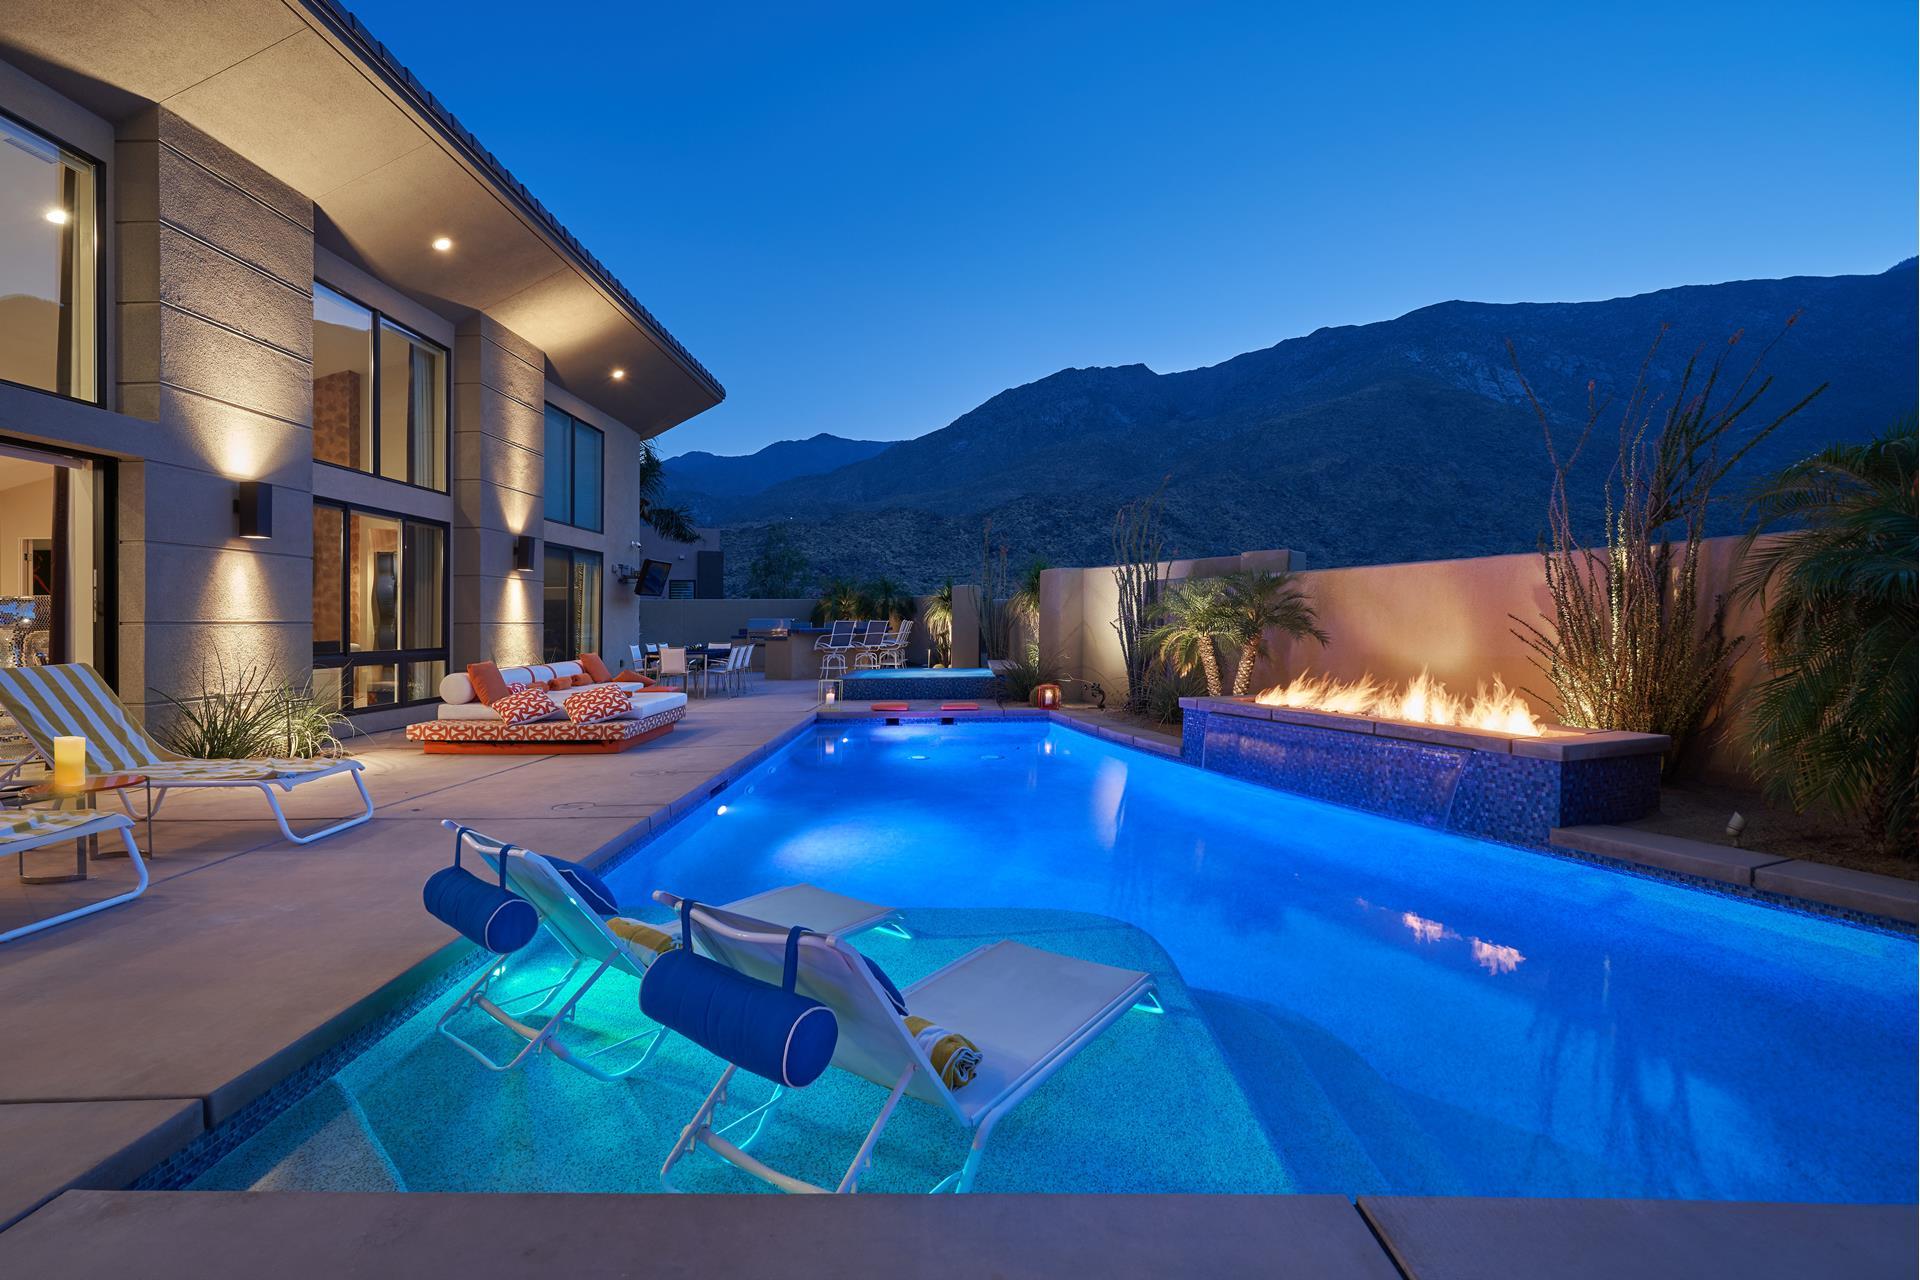 3149 Cody Court - Palm Springs, California